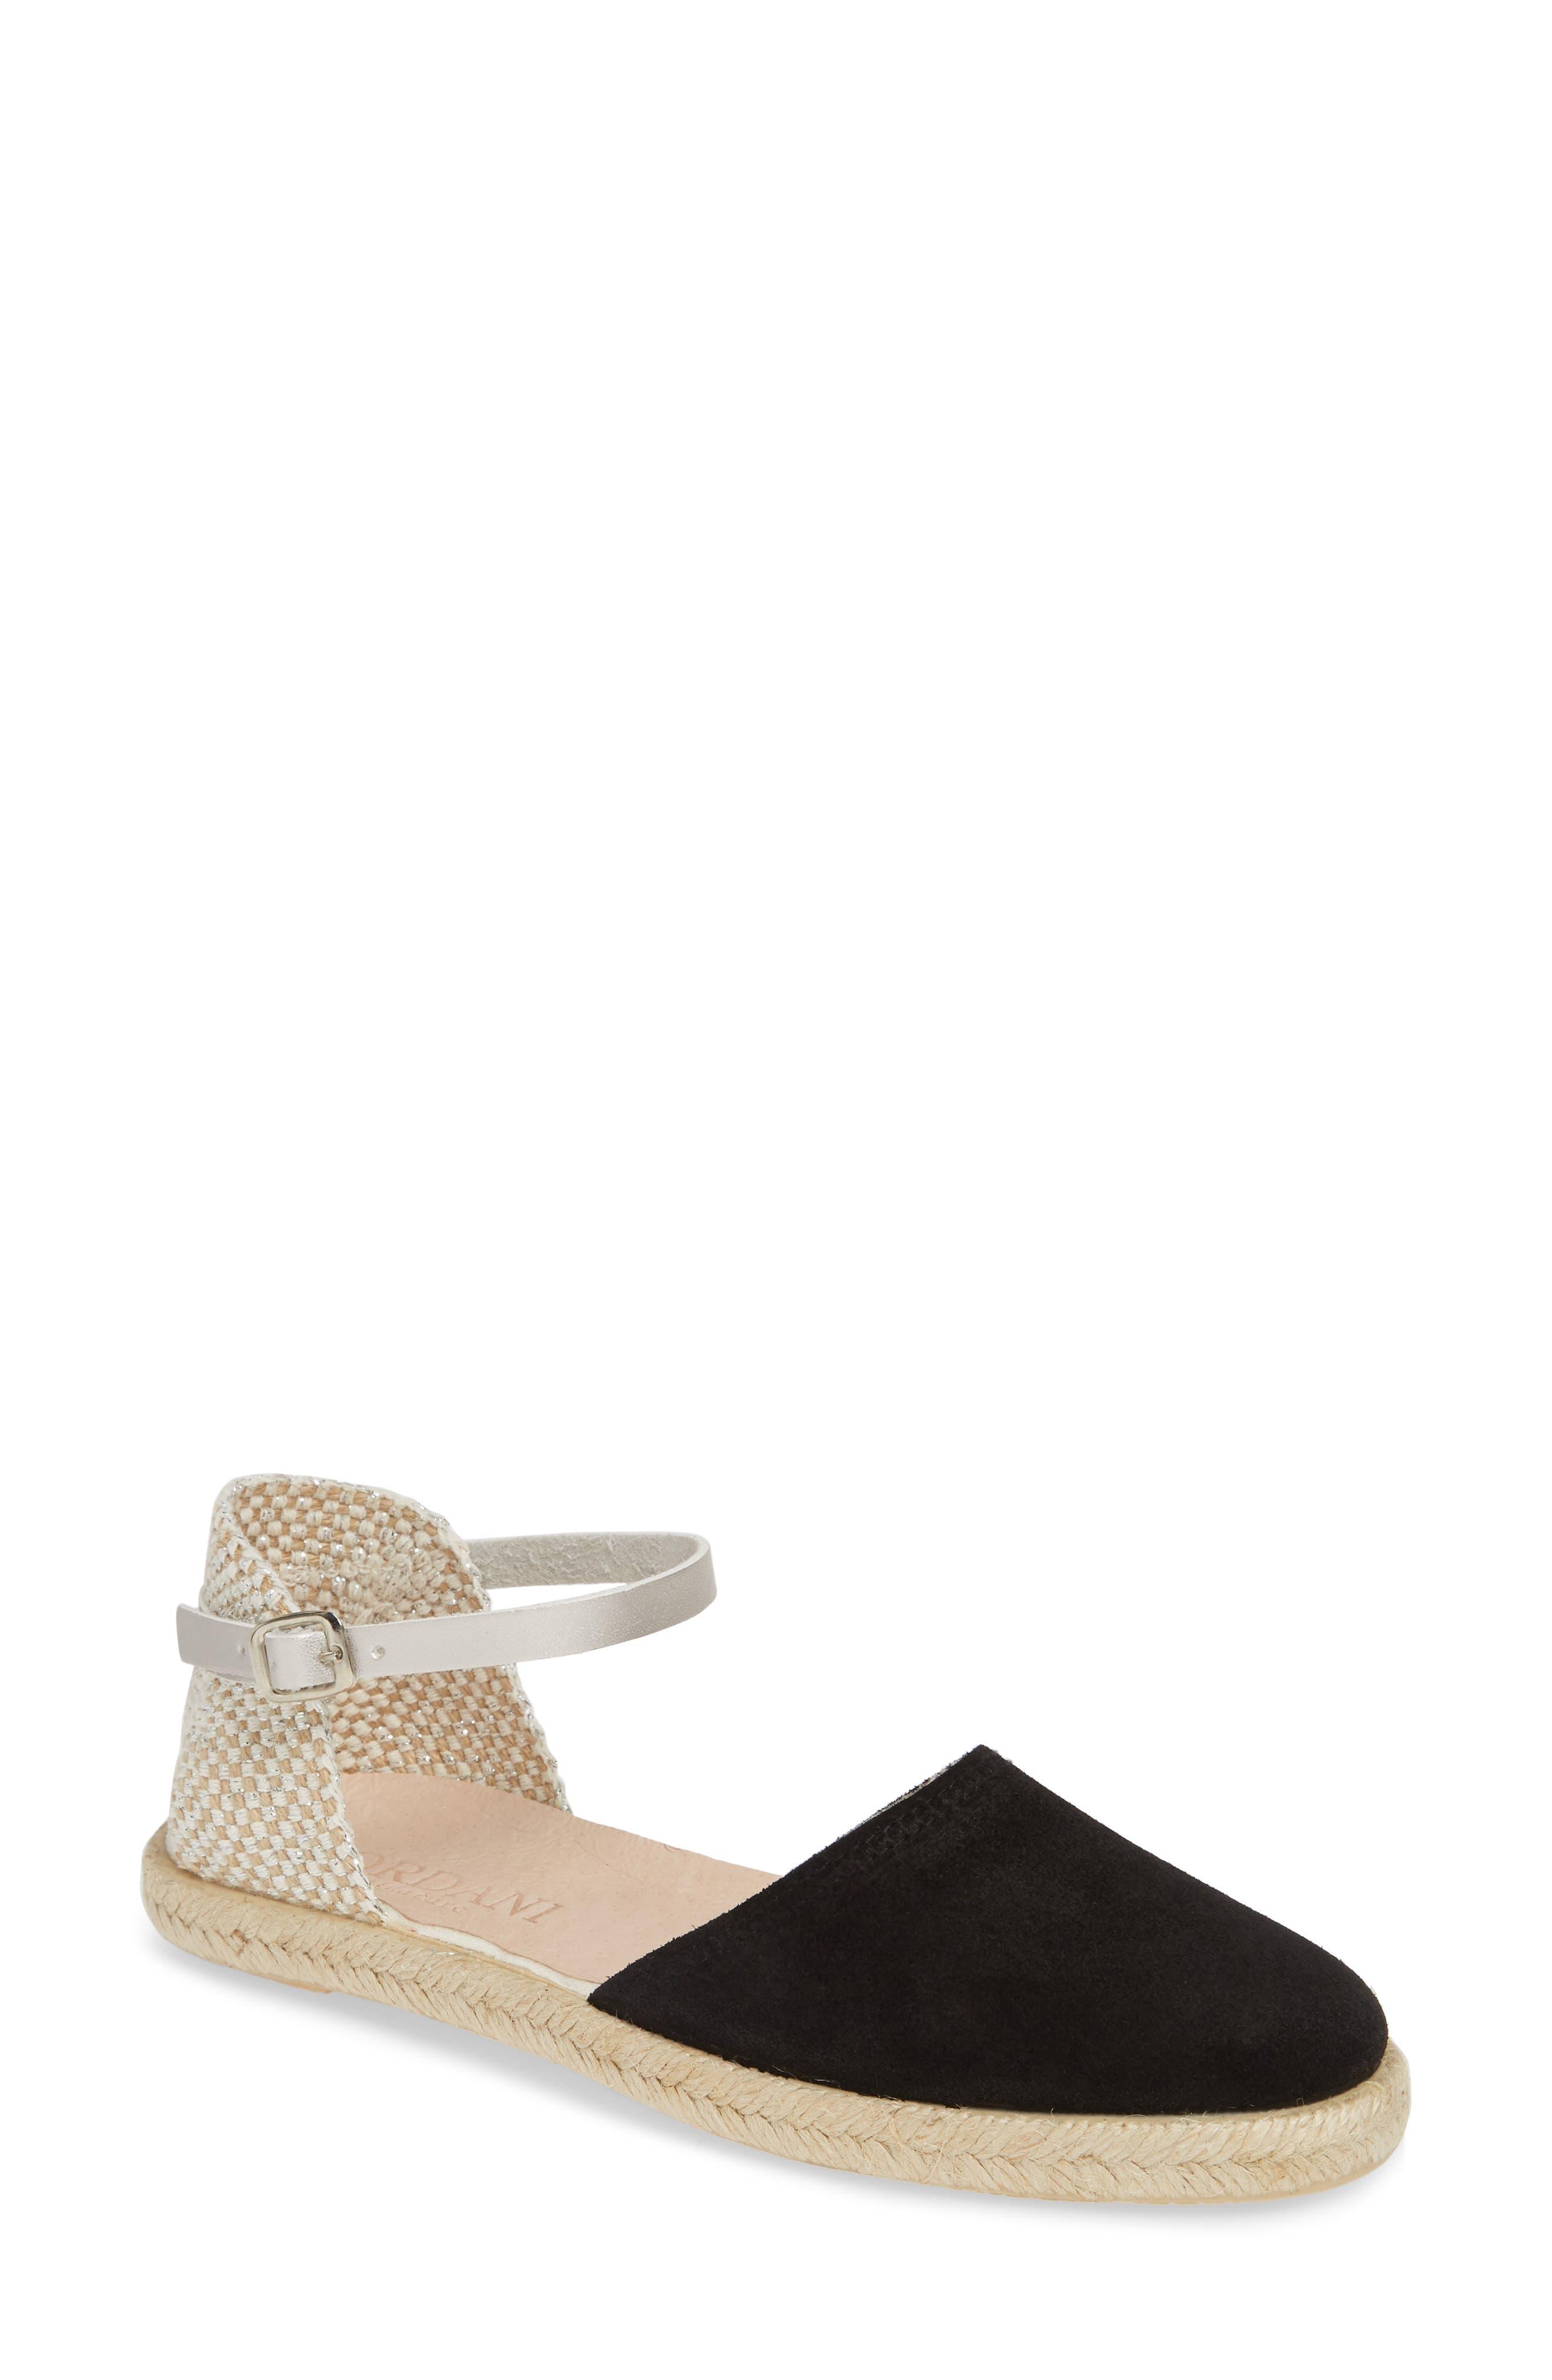 Bertie Espadrille Sandal, Main, color, BLACK SUEDE